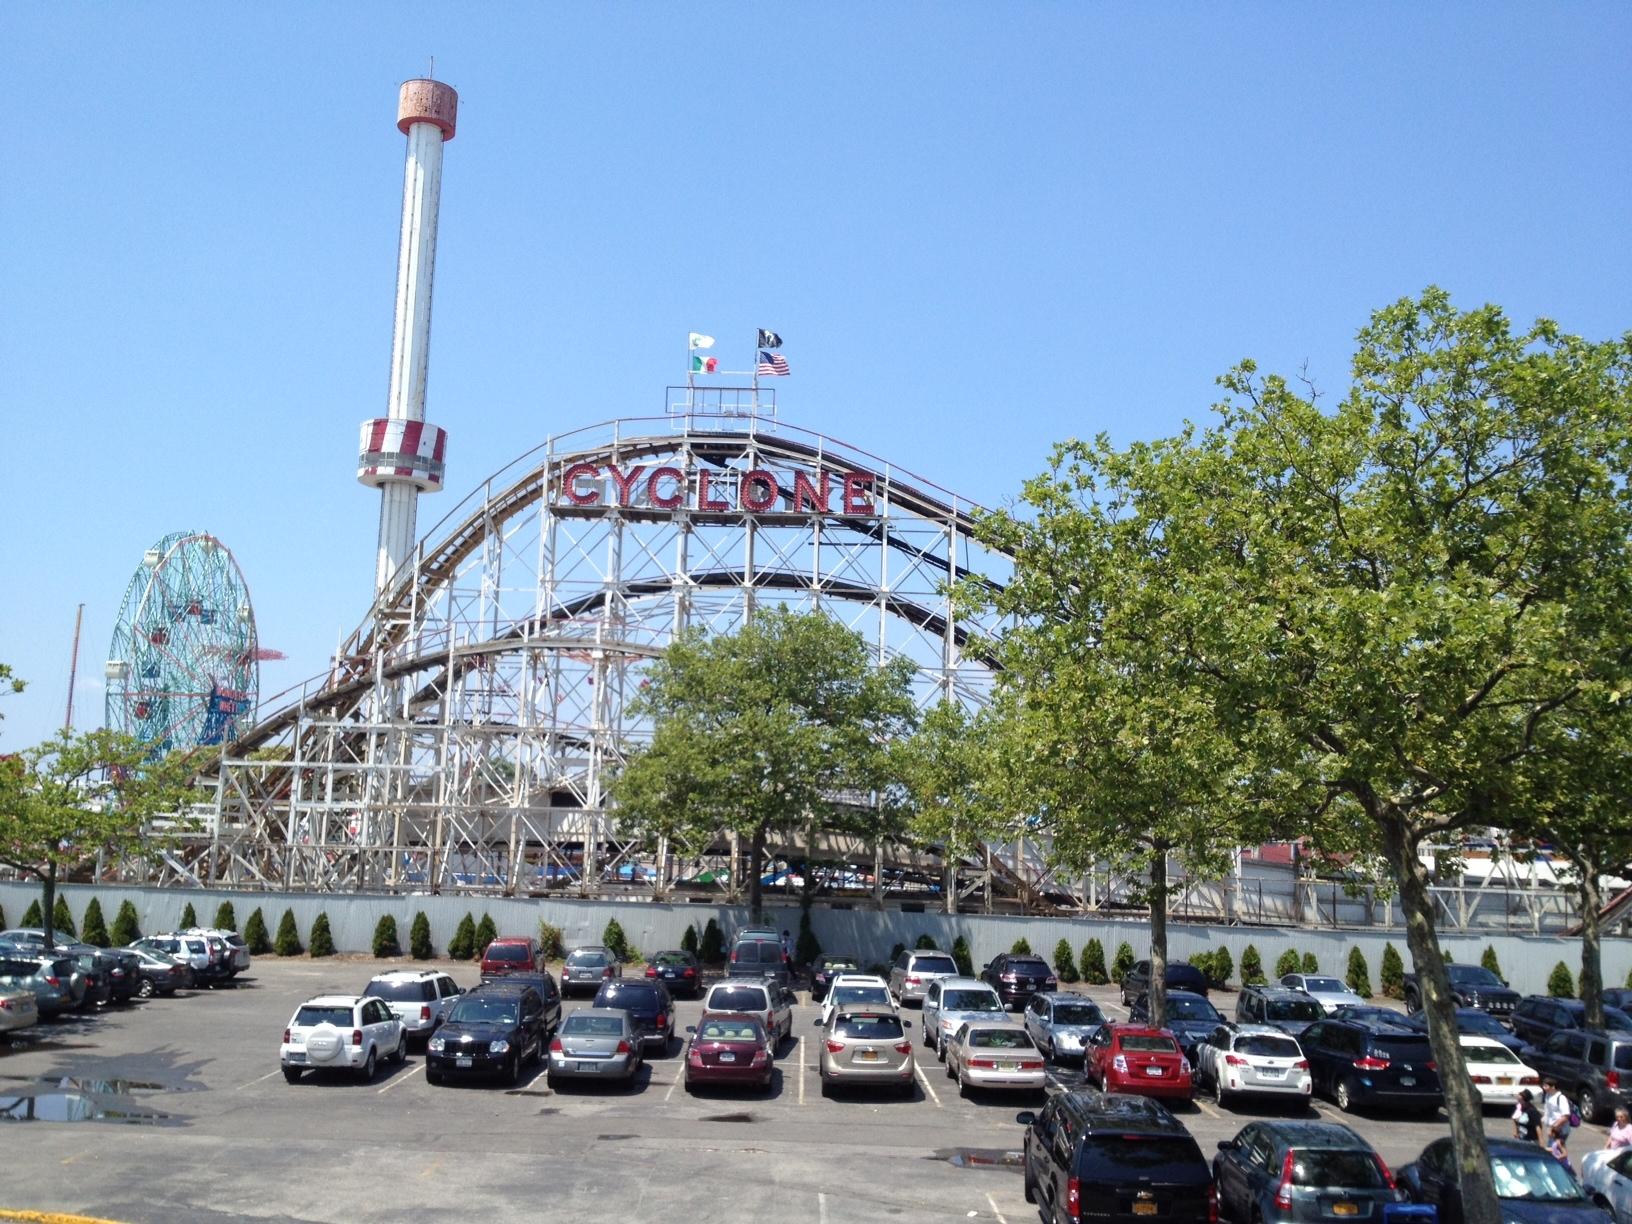 a day of fun coney island brooklyn new york amusement park chixpix. Black Bedroom Furniture Sets. Home Design Ideas